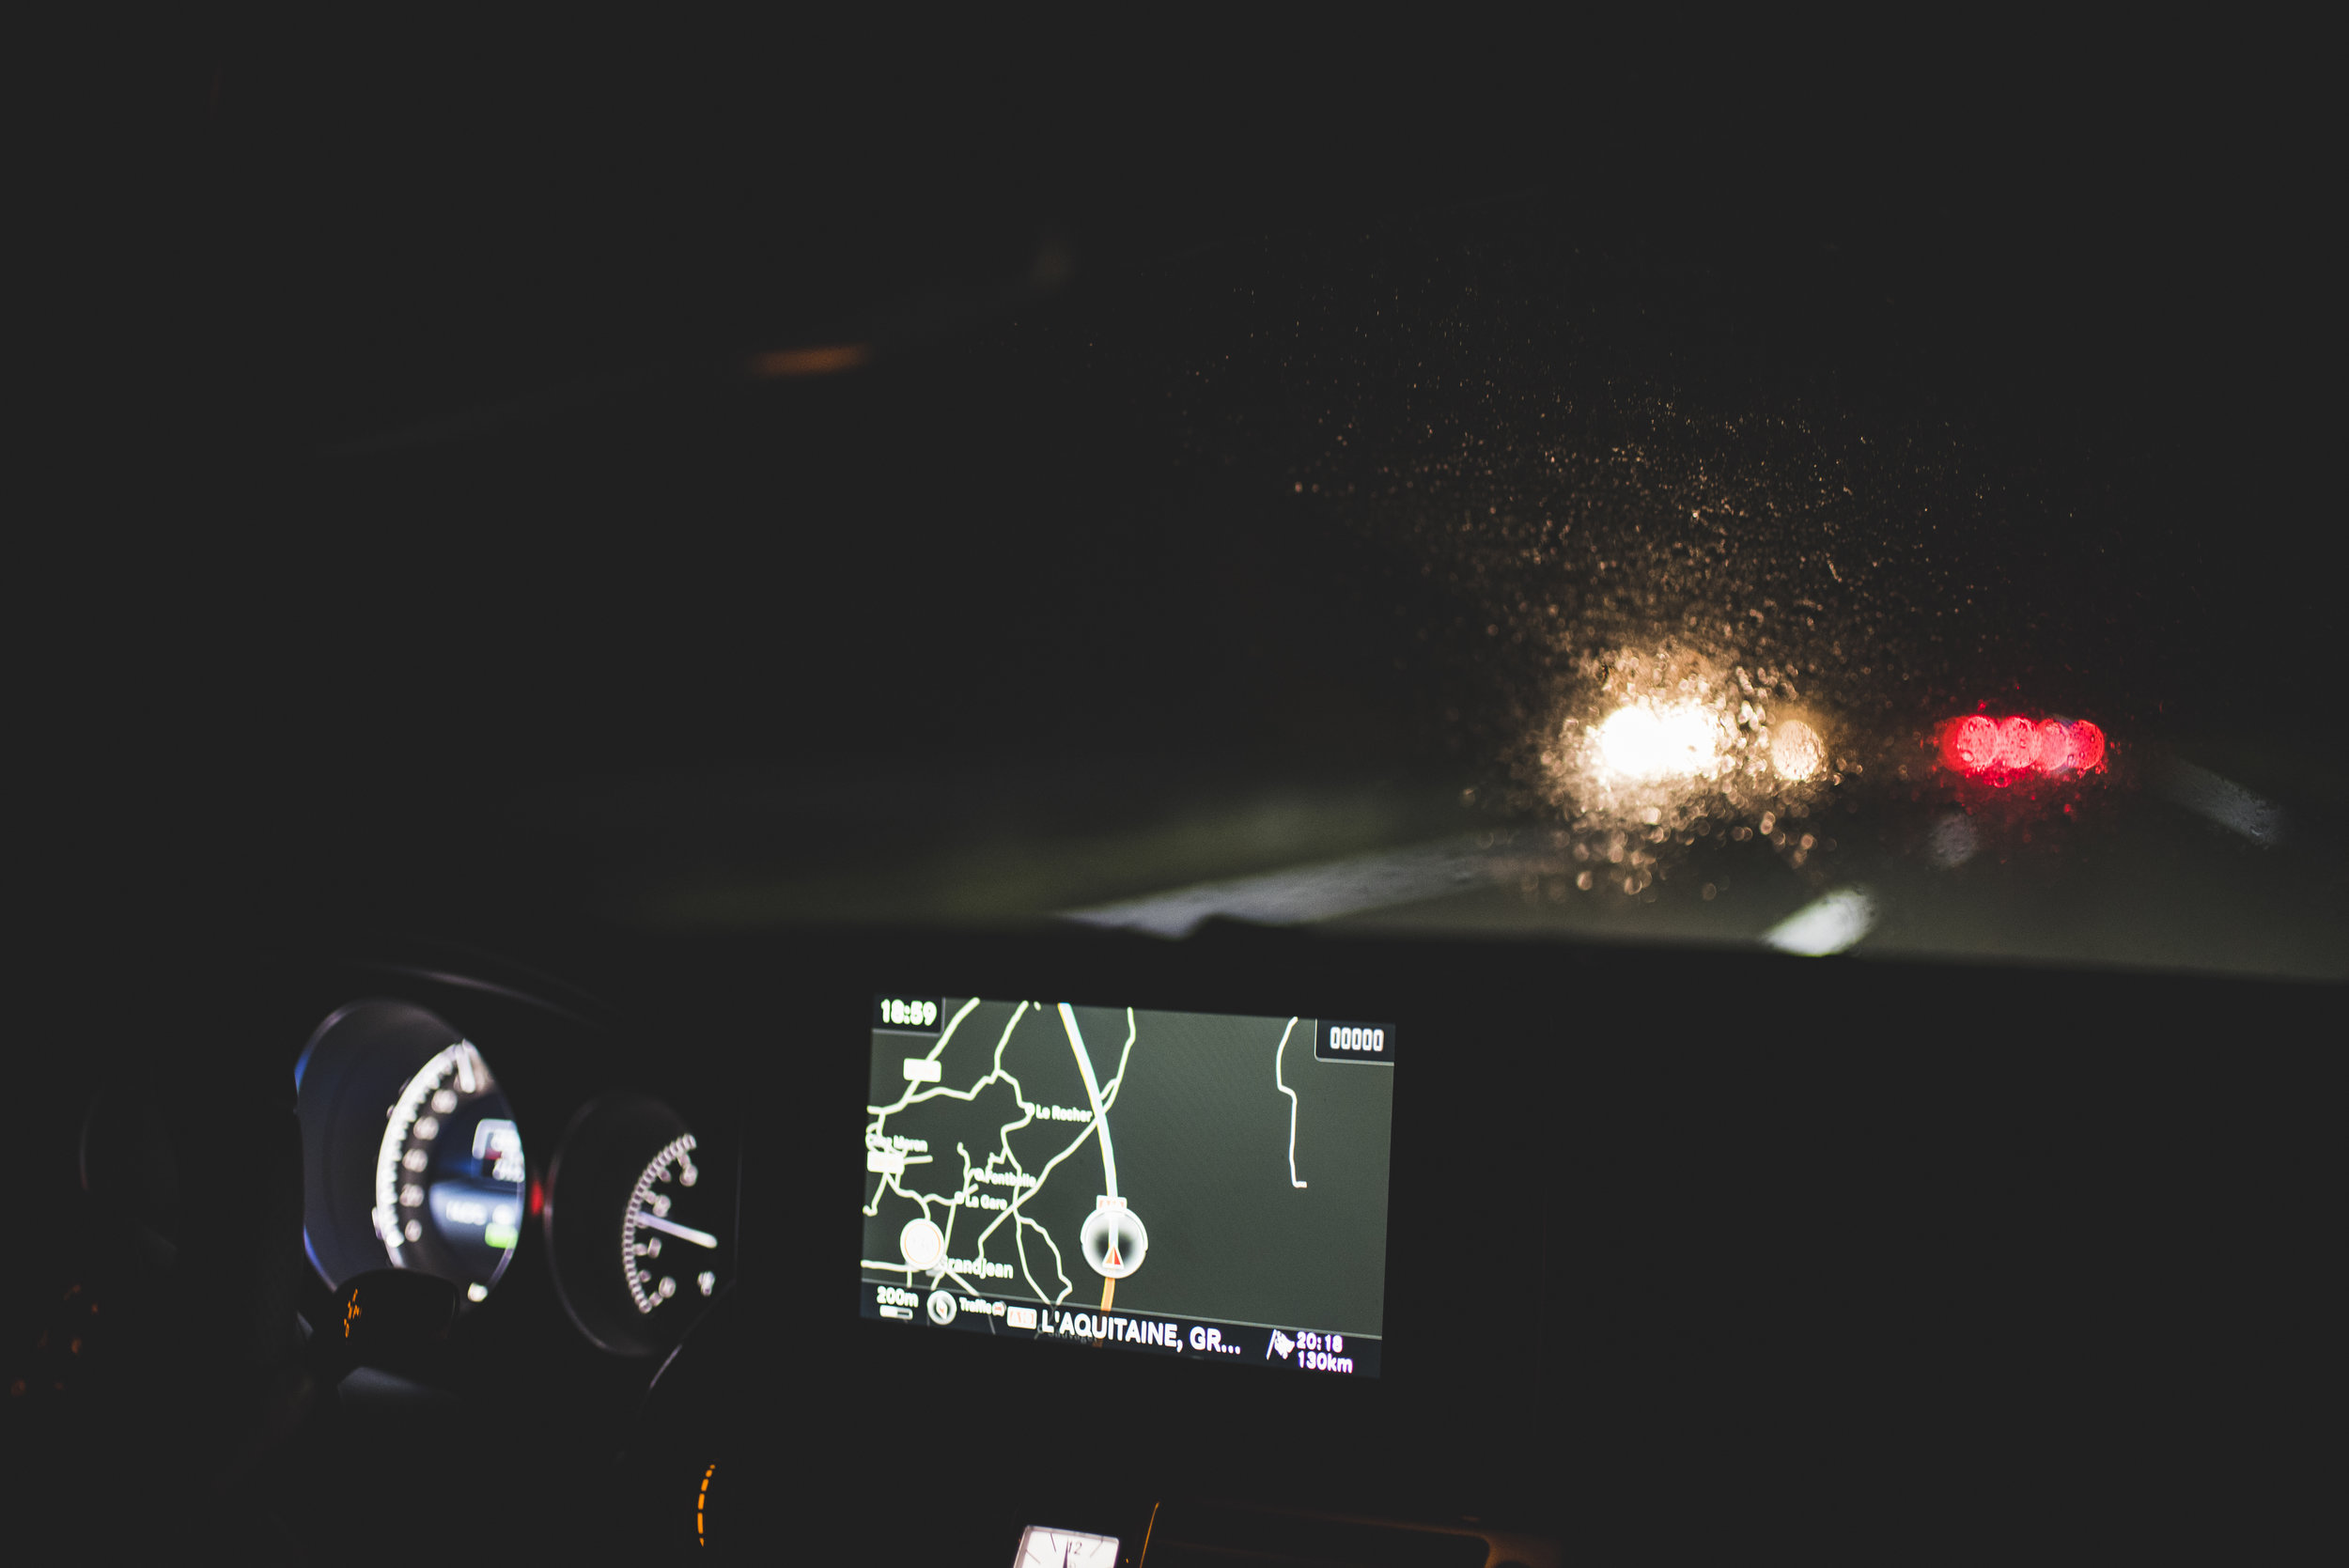 Malaga_Roadtrip-32.jpg